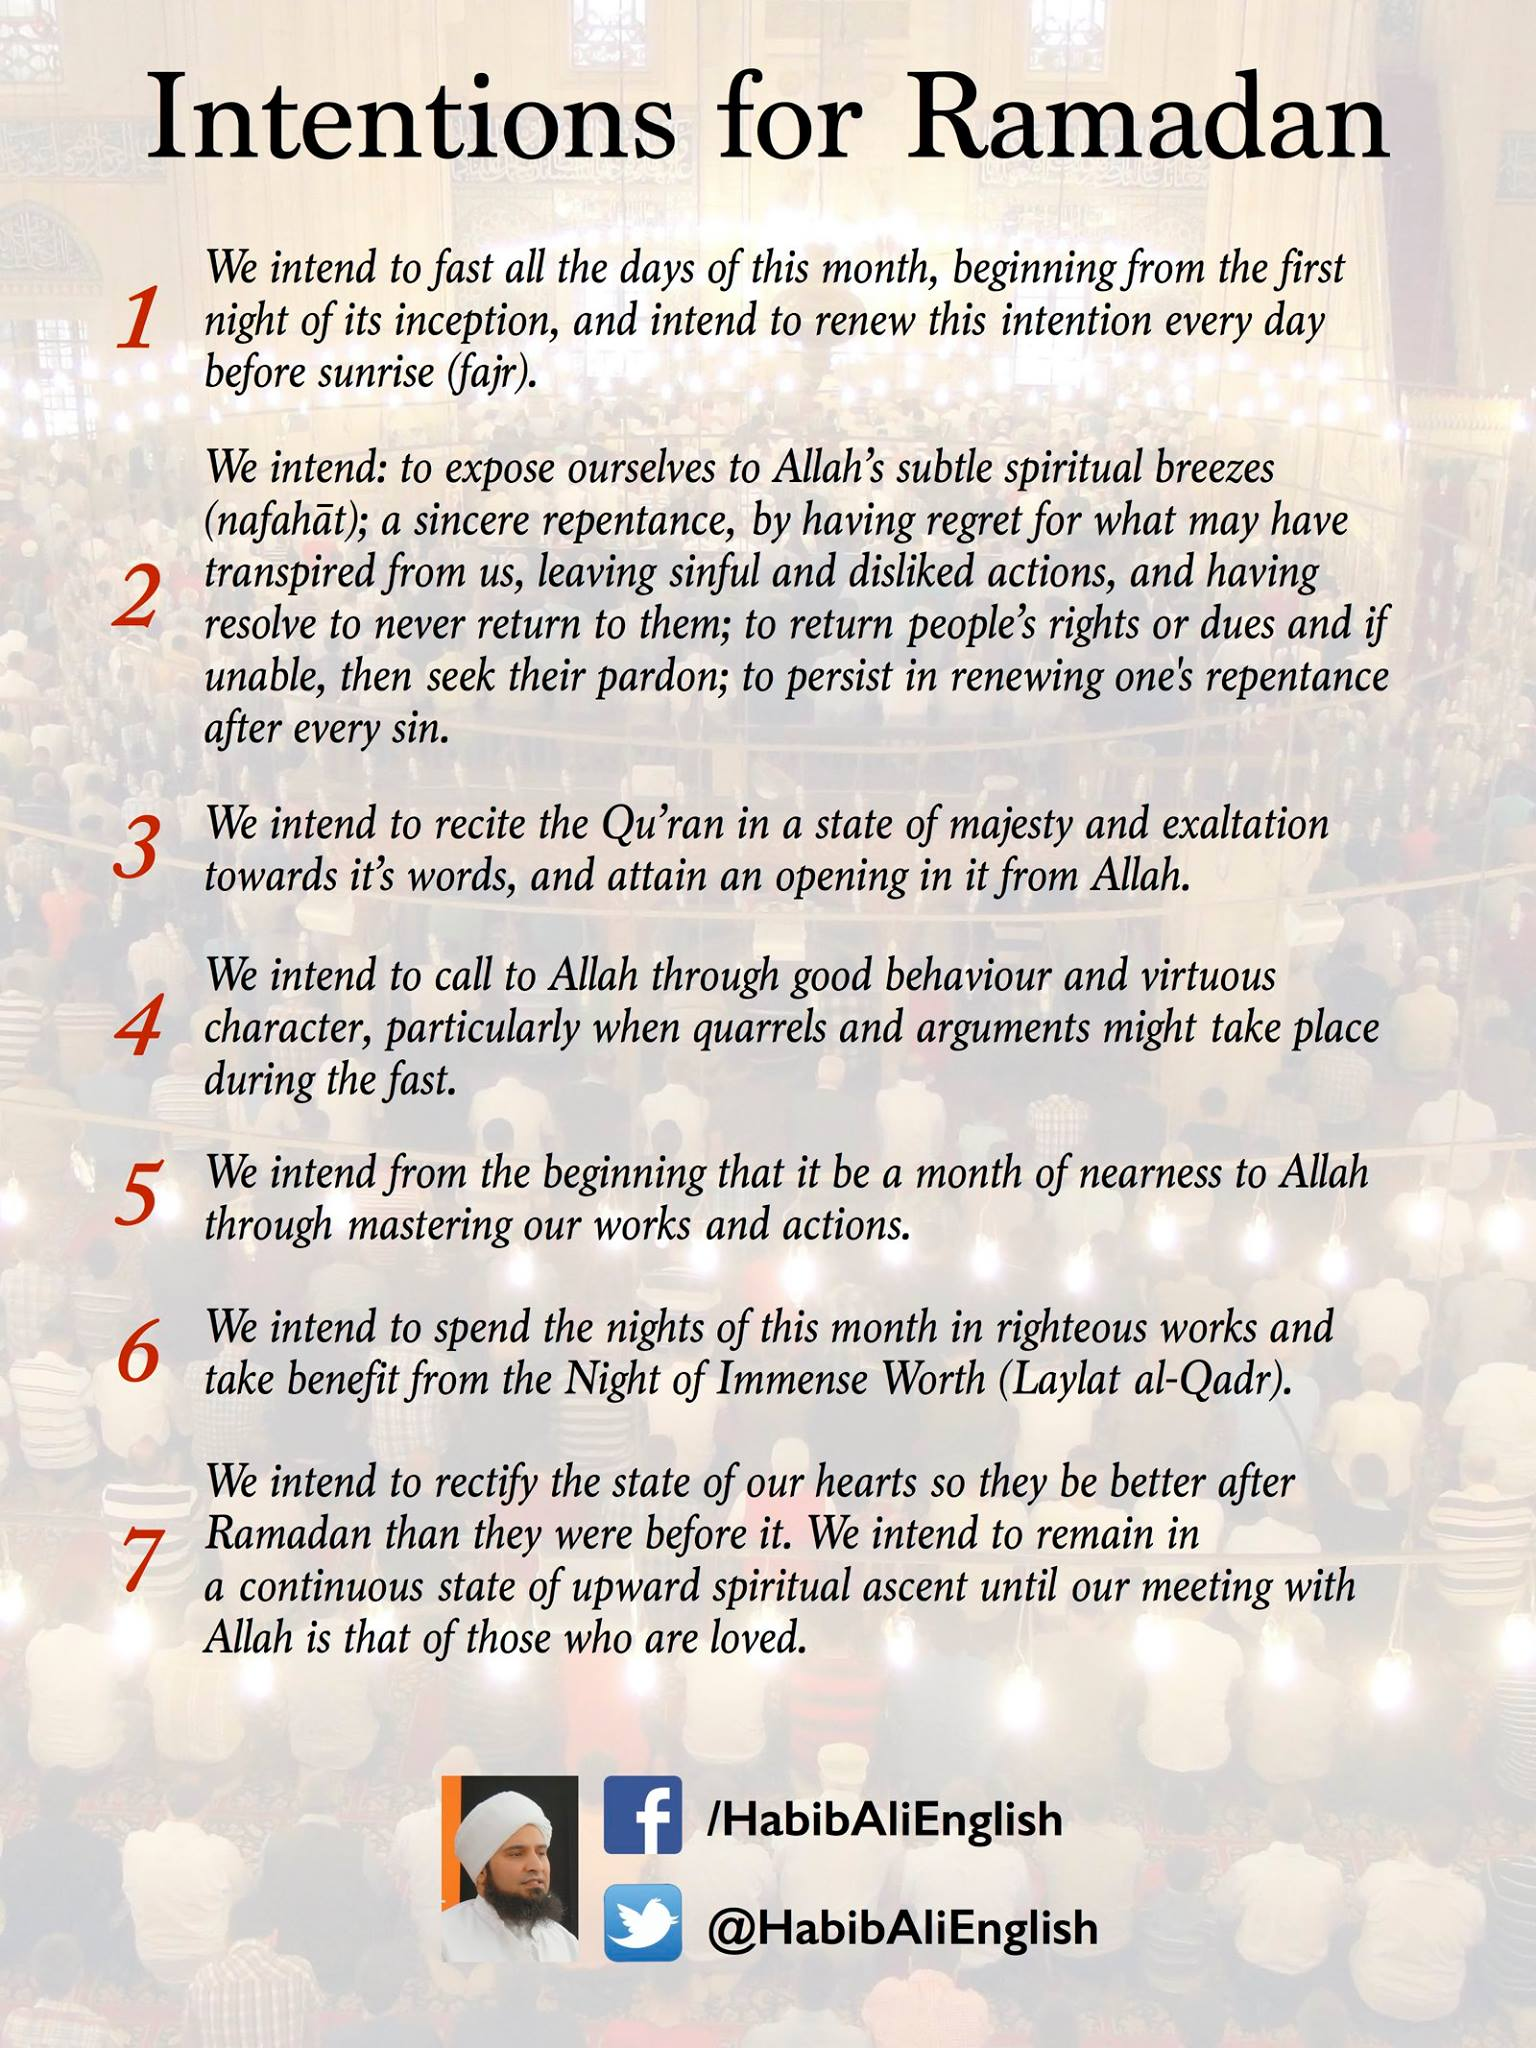 habib_ali_intentions_for_ramadan